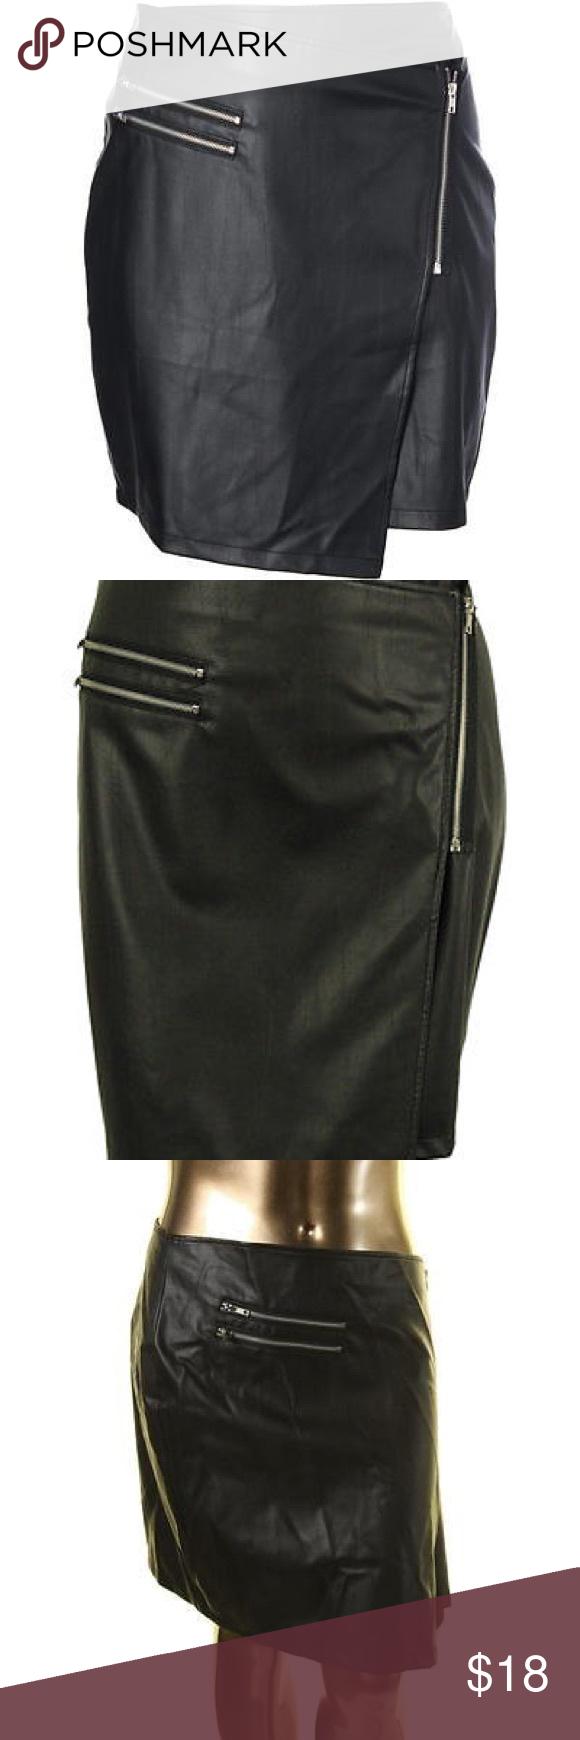 Torrid nwot cool Blk faux leather skirt size 0 Faux